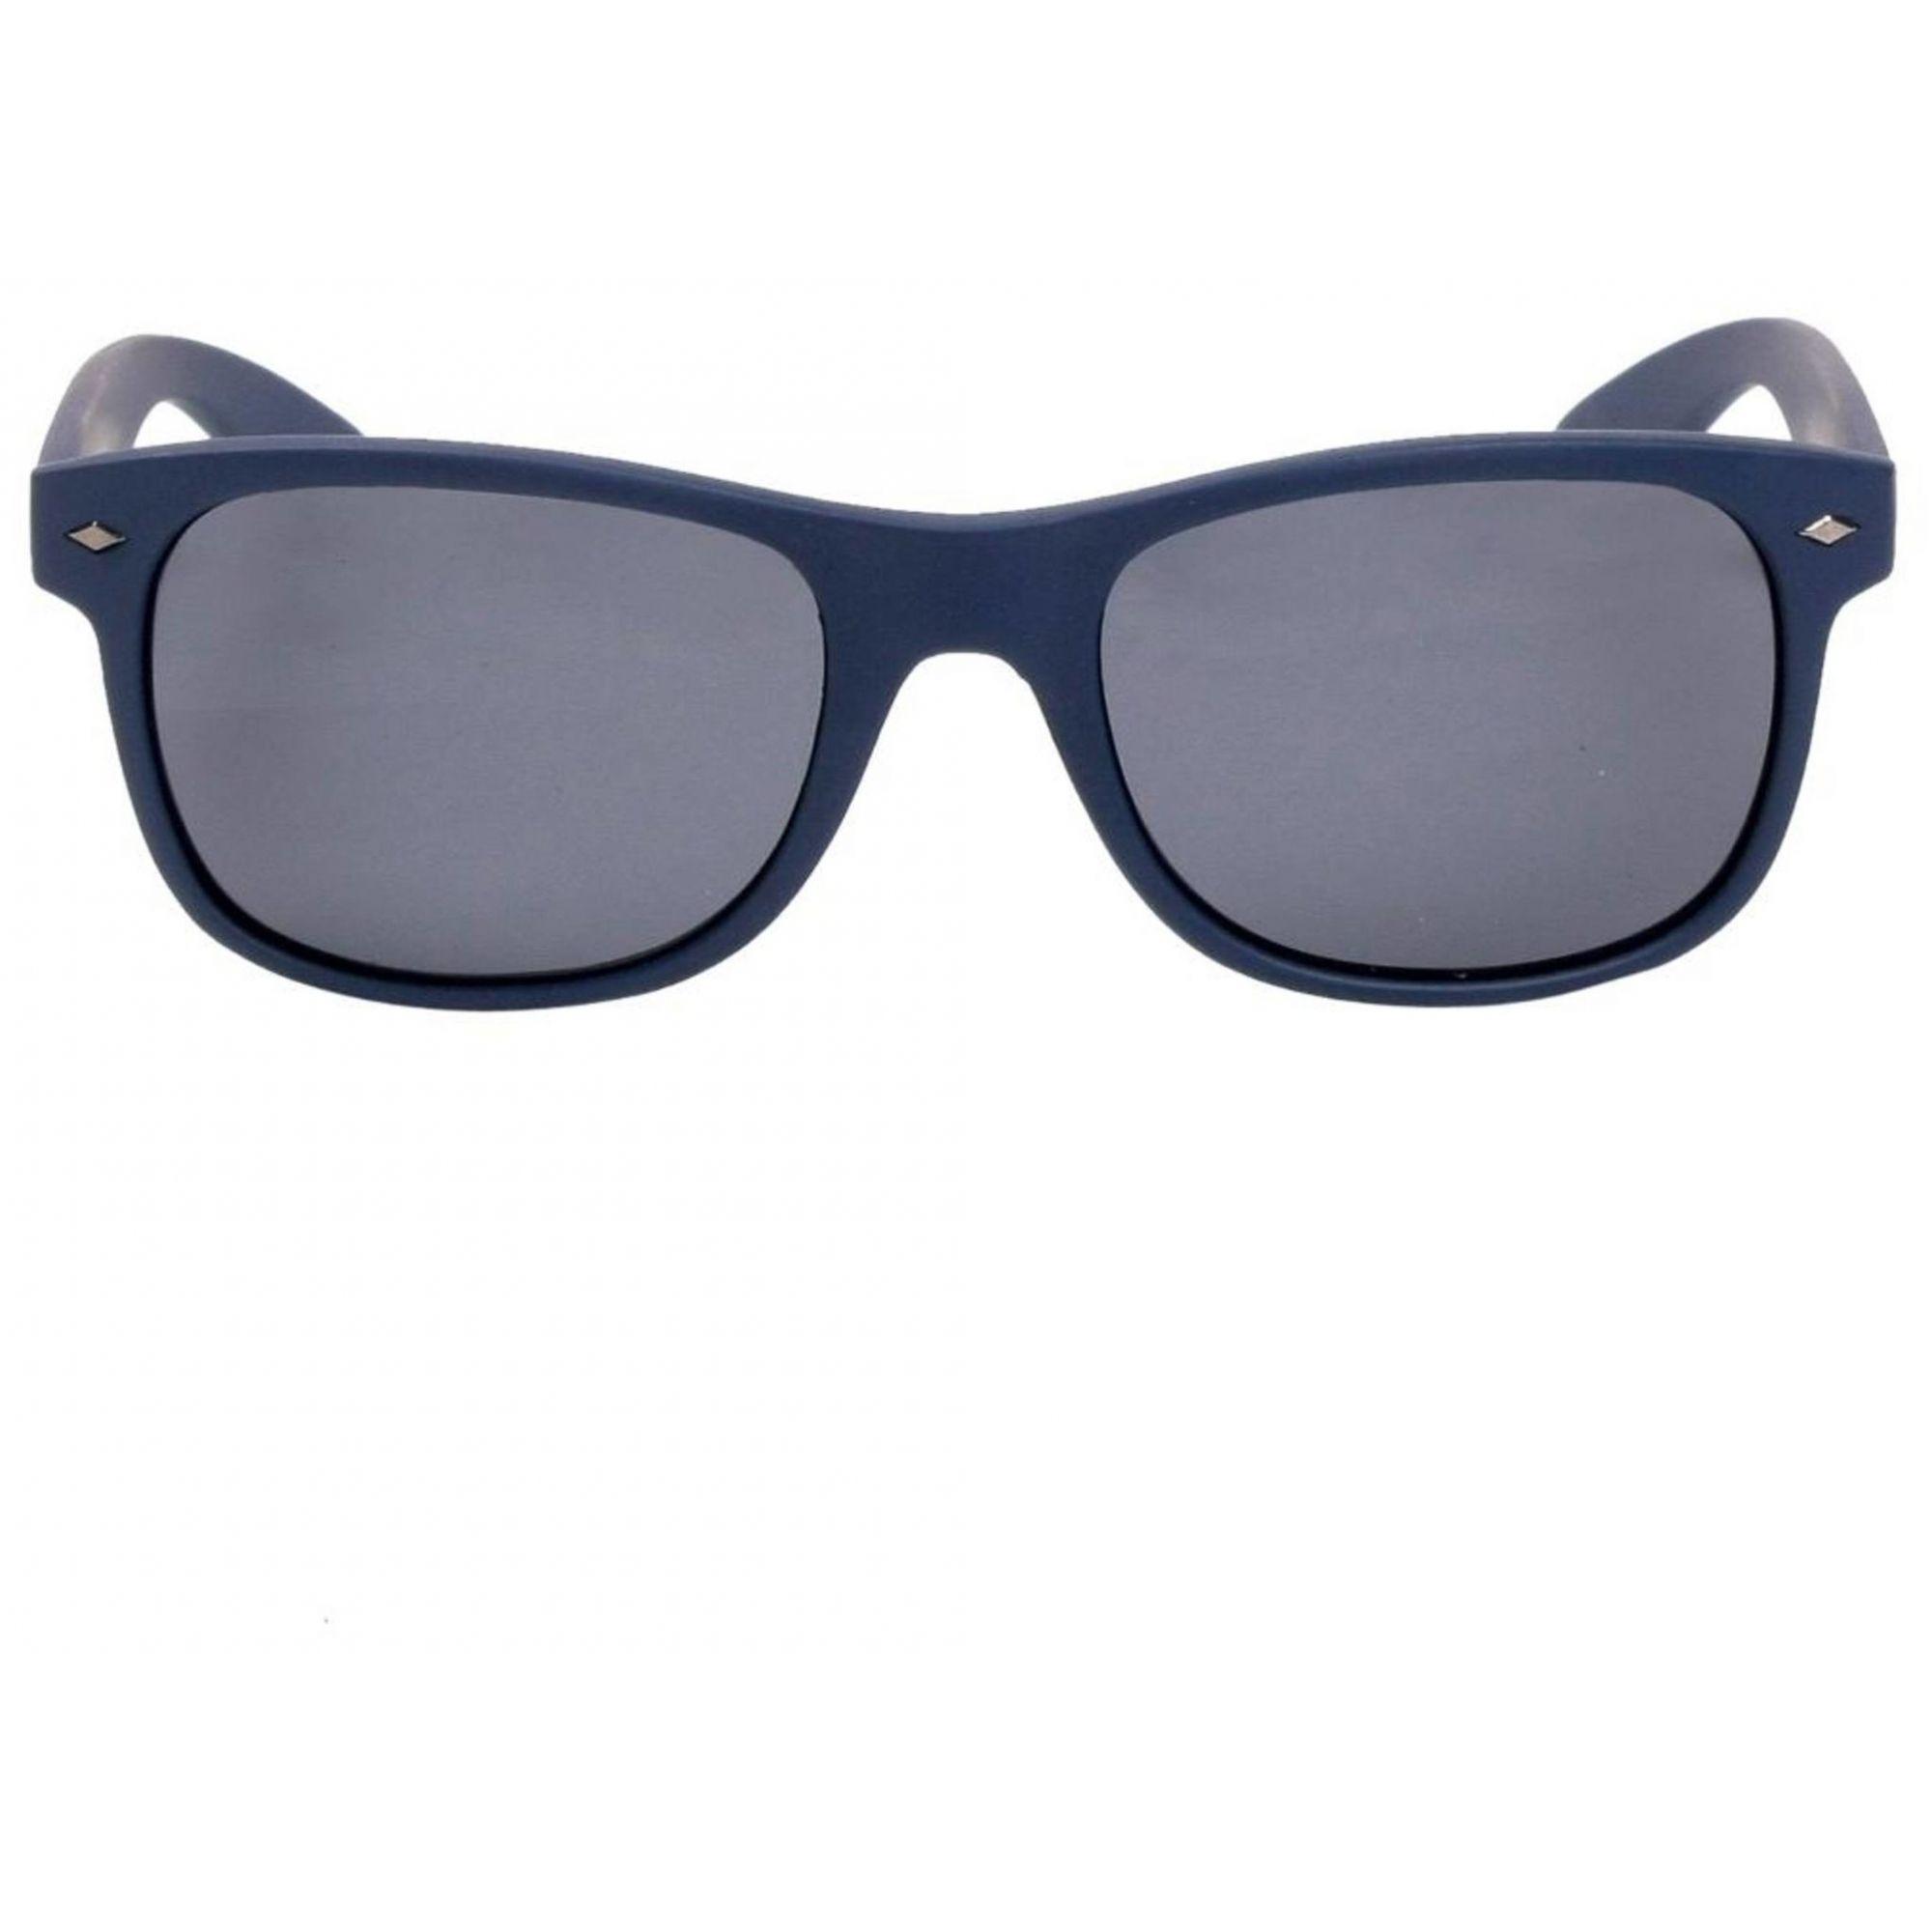 Óculos de Sol Polaroid Masculino PLD1015/S X03C3